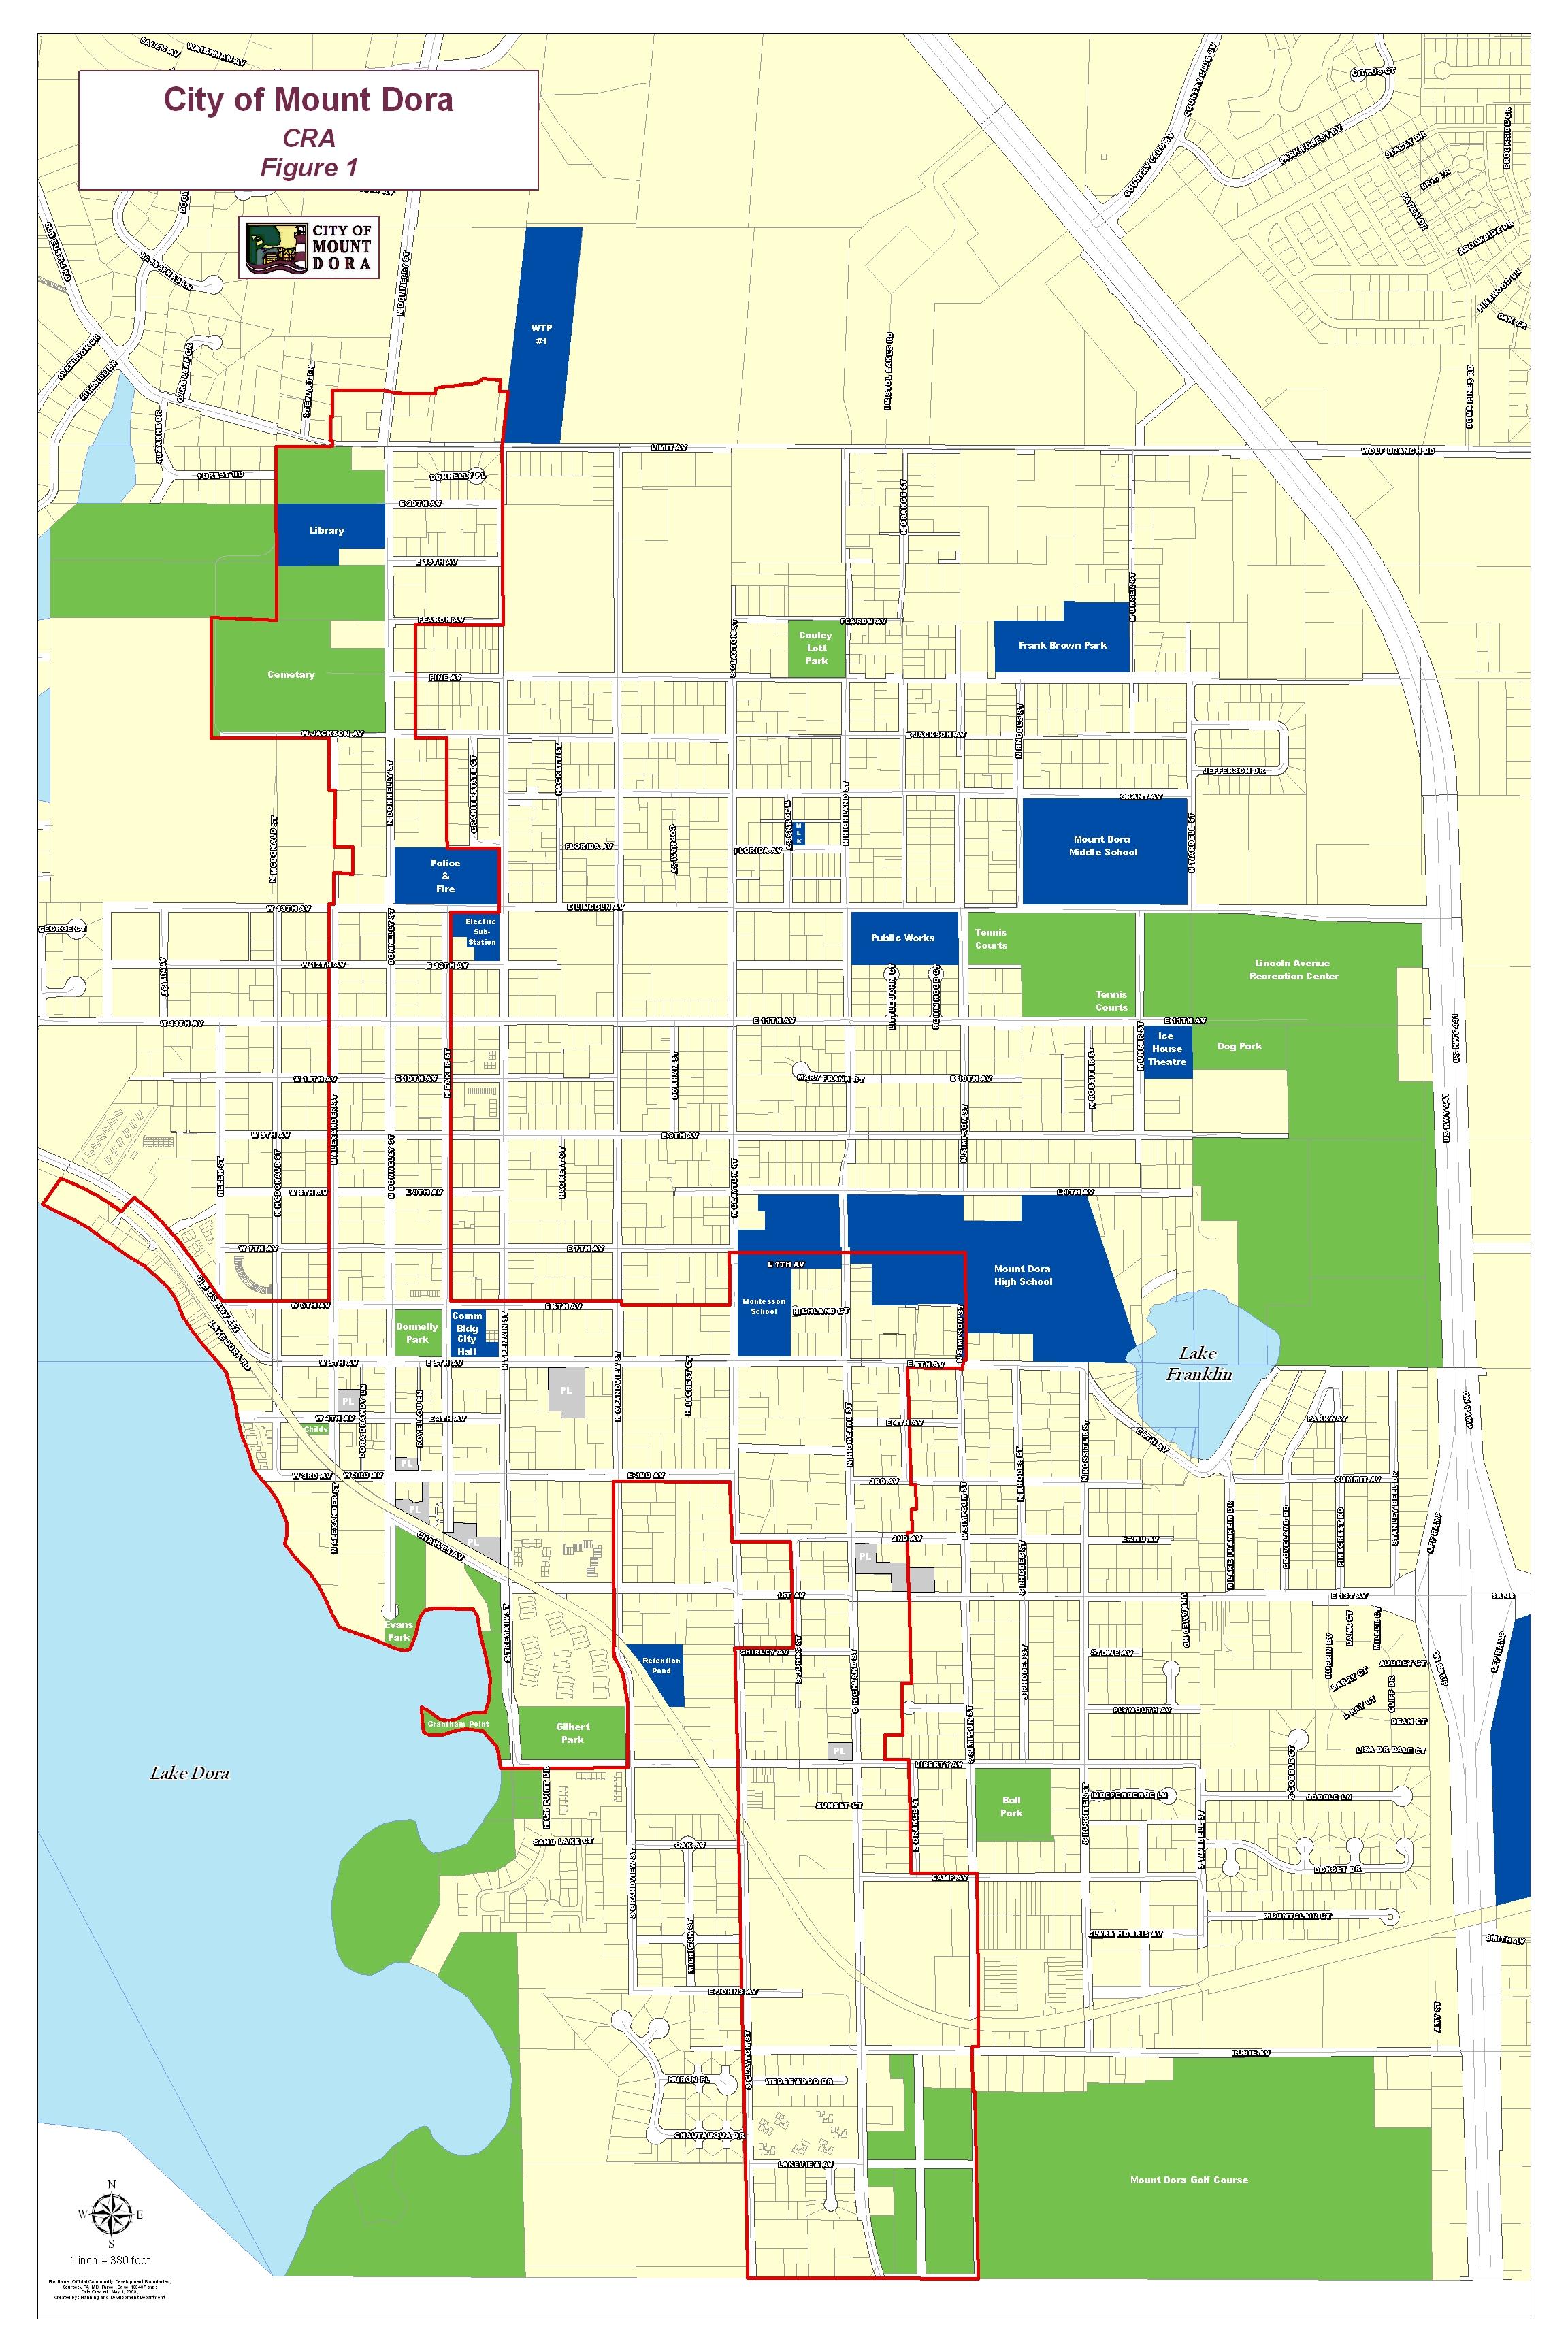 CRA District Map Mount Dora FL Official Website - Florida map mount dora